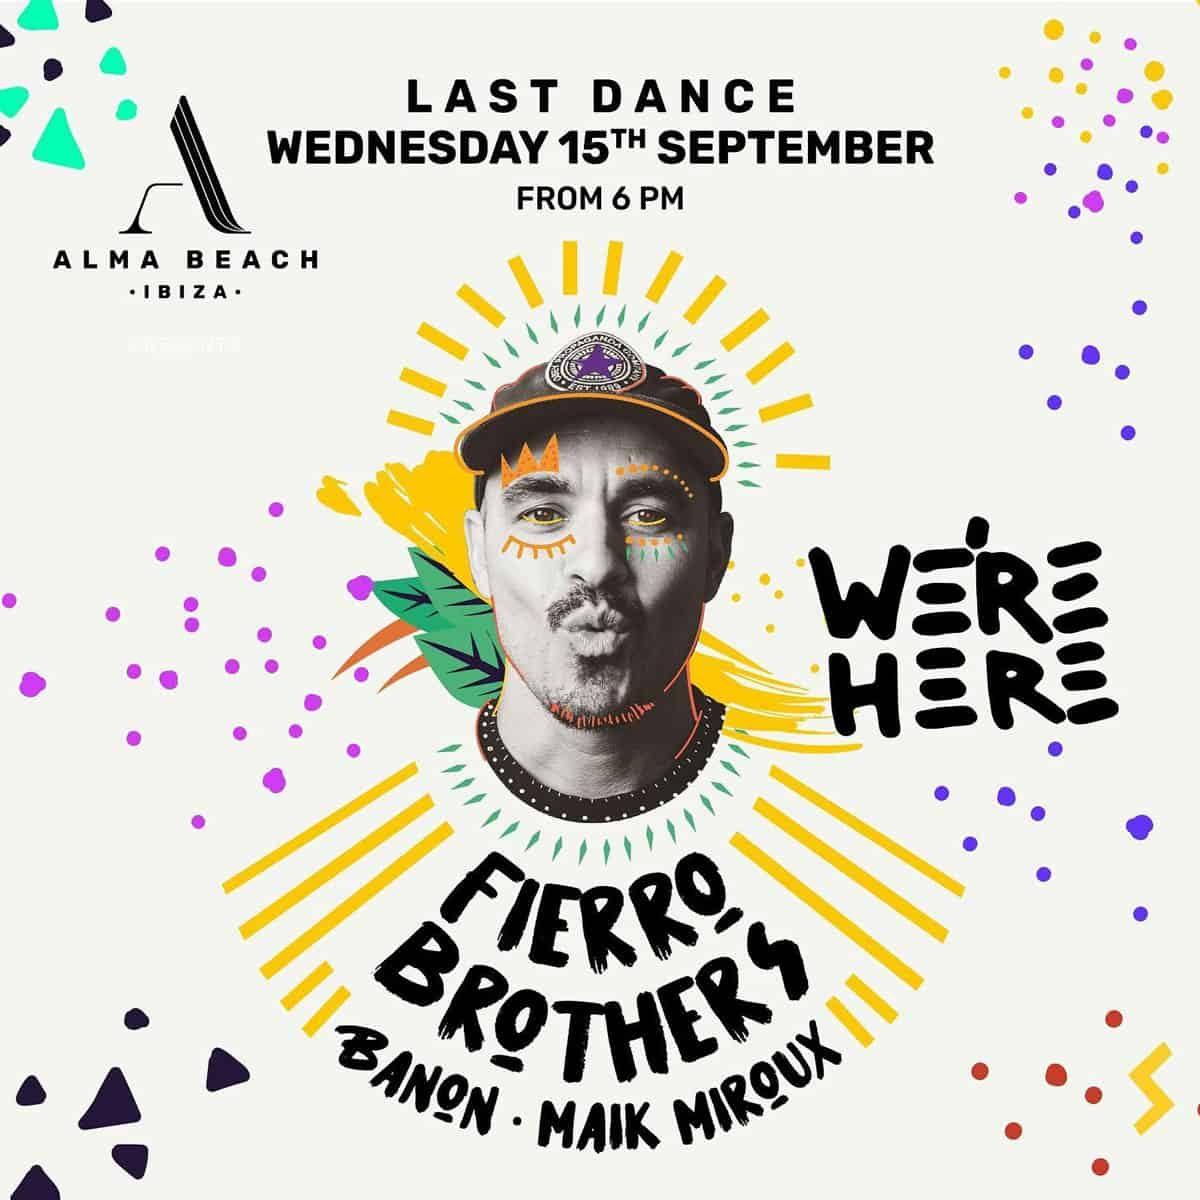 pablo-fierro-last-dance-alma-beach-ibiza-2021-welcometoibiza